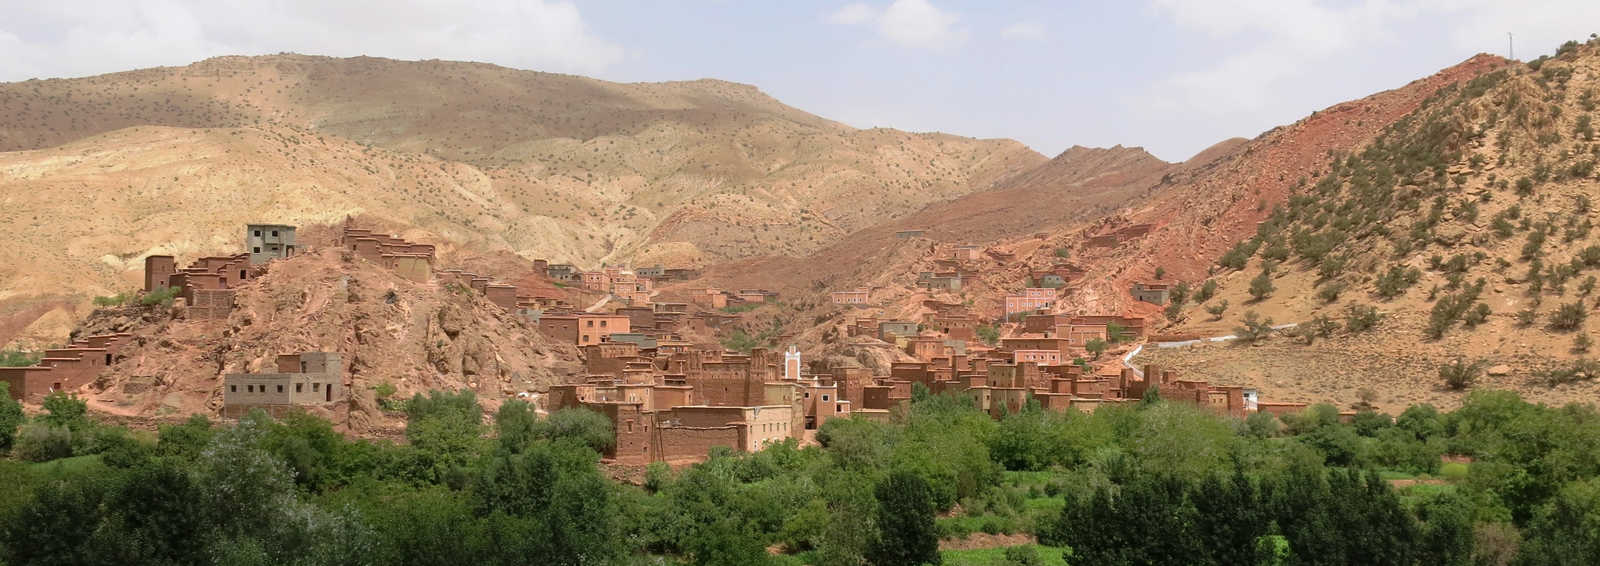 Tijhza Village